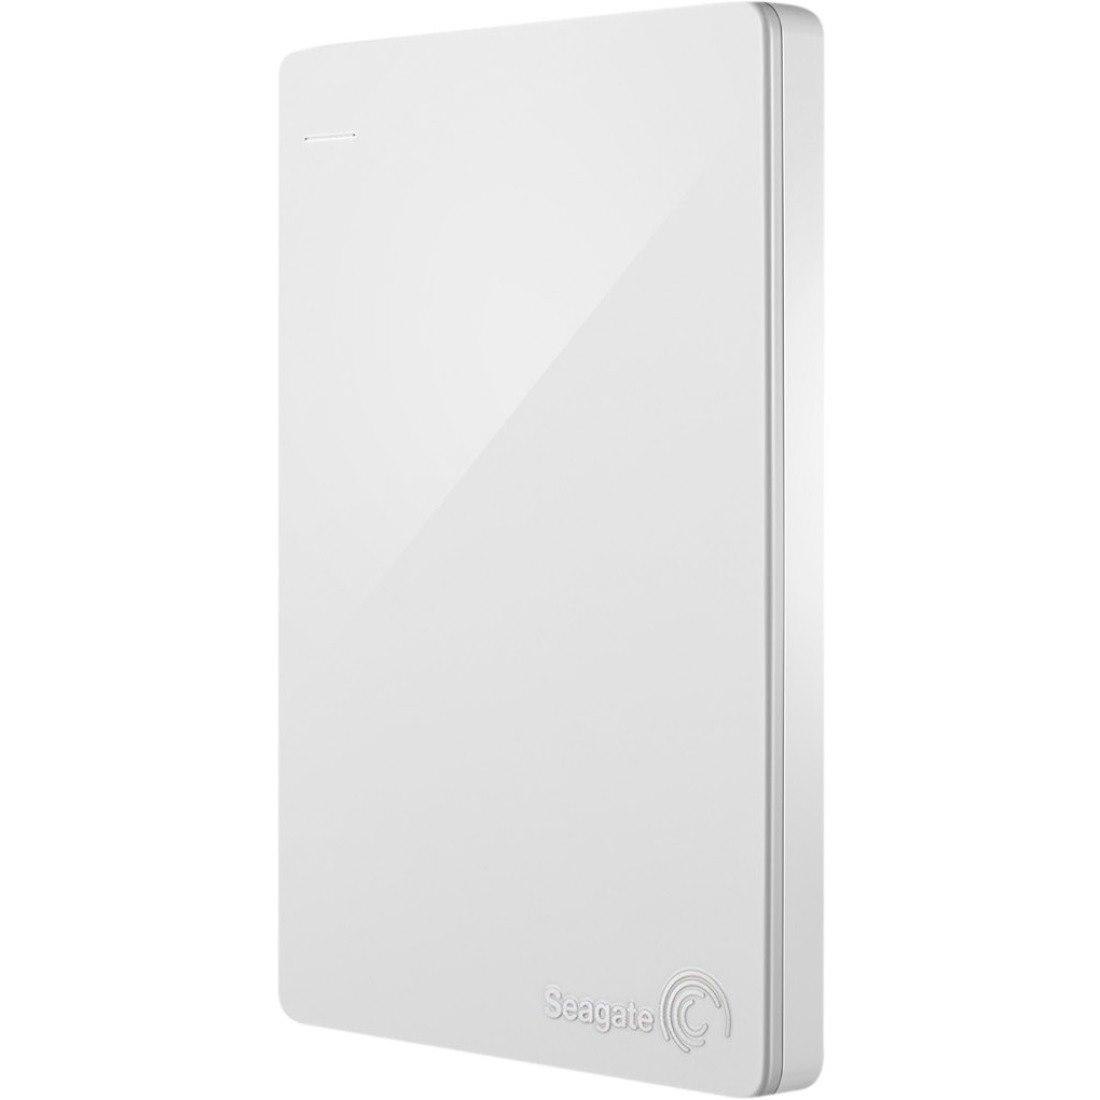 "Seagate Backup Plus Slim 2 TB Hard Drive - 2.5"" Drive - External - Portable"